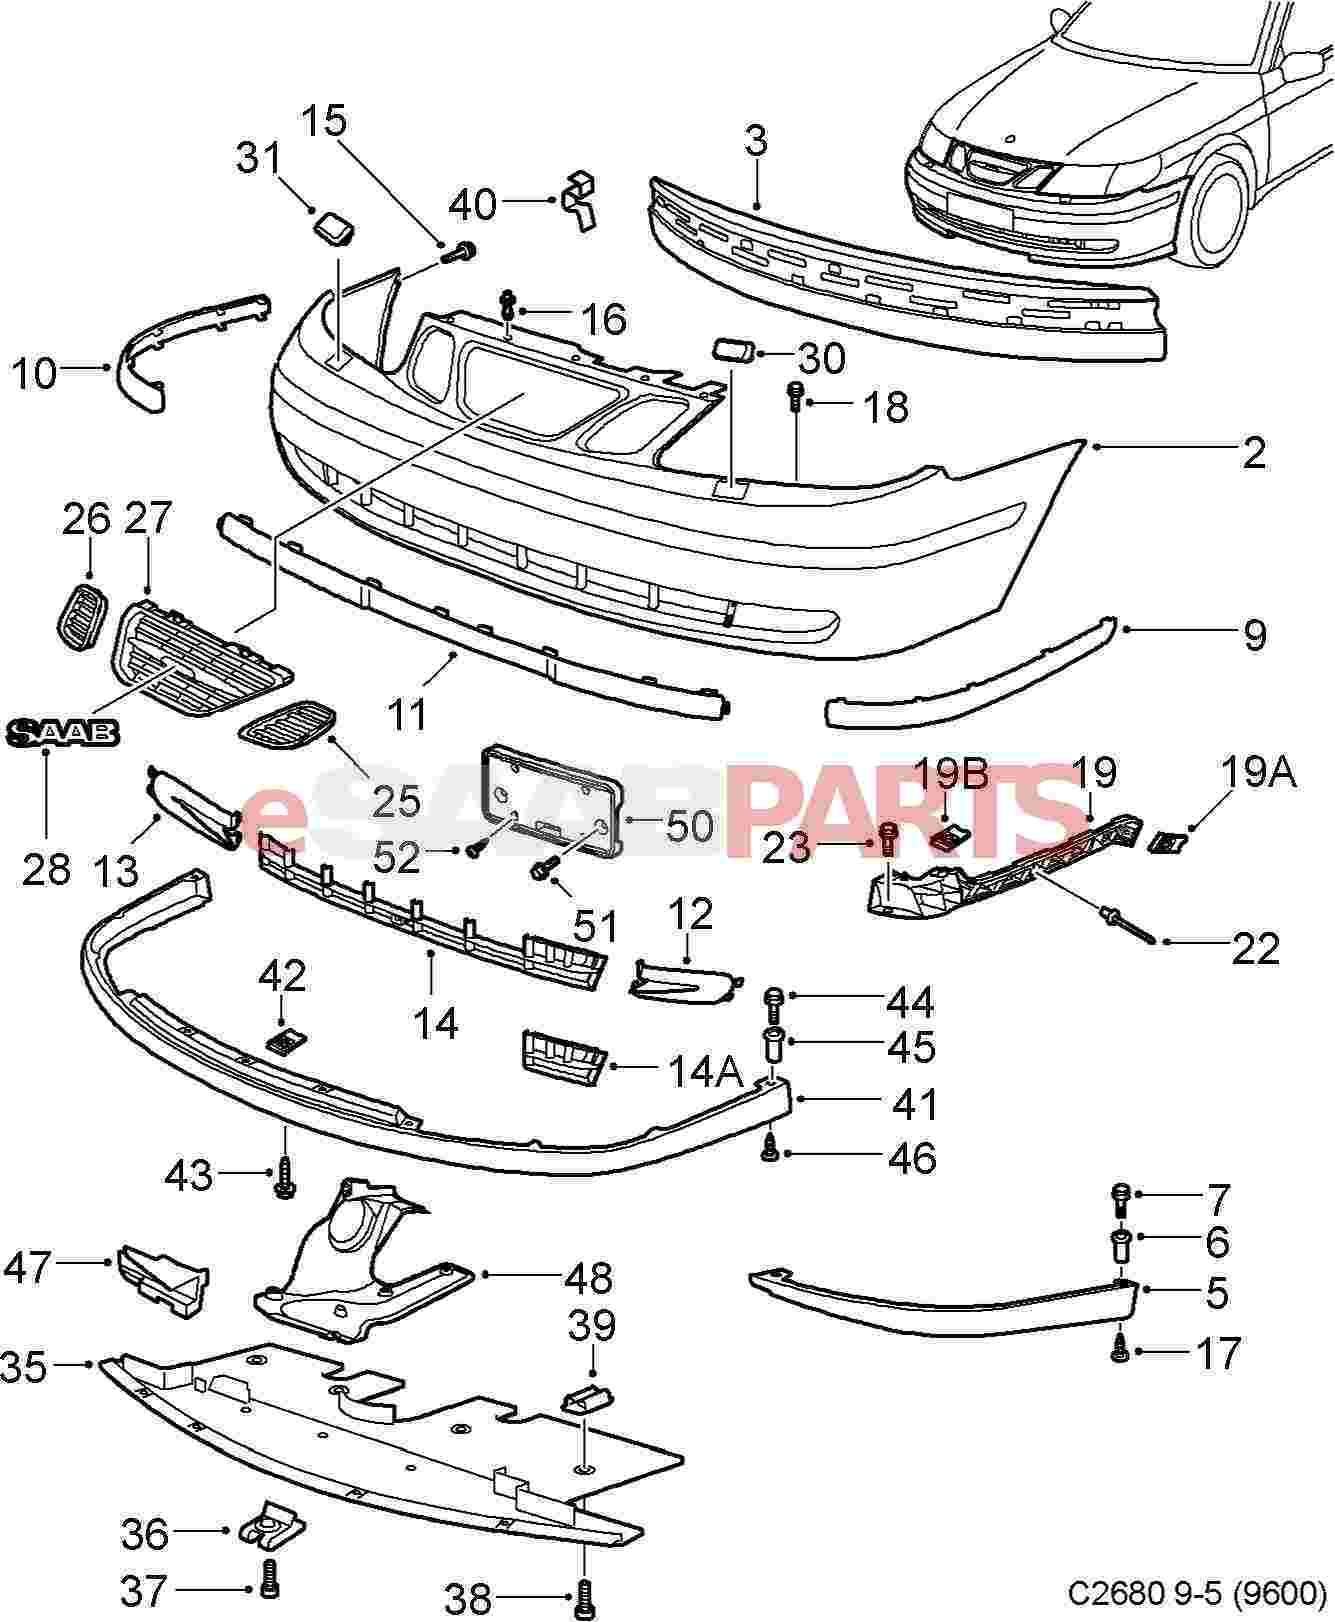 32016136 saab front bumper cover w headlamp washers. Black Bedroom Furniture Sets. Home Design Ideas